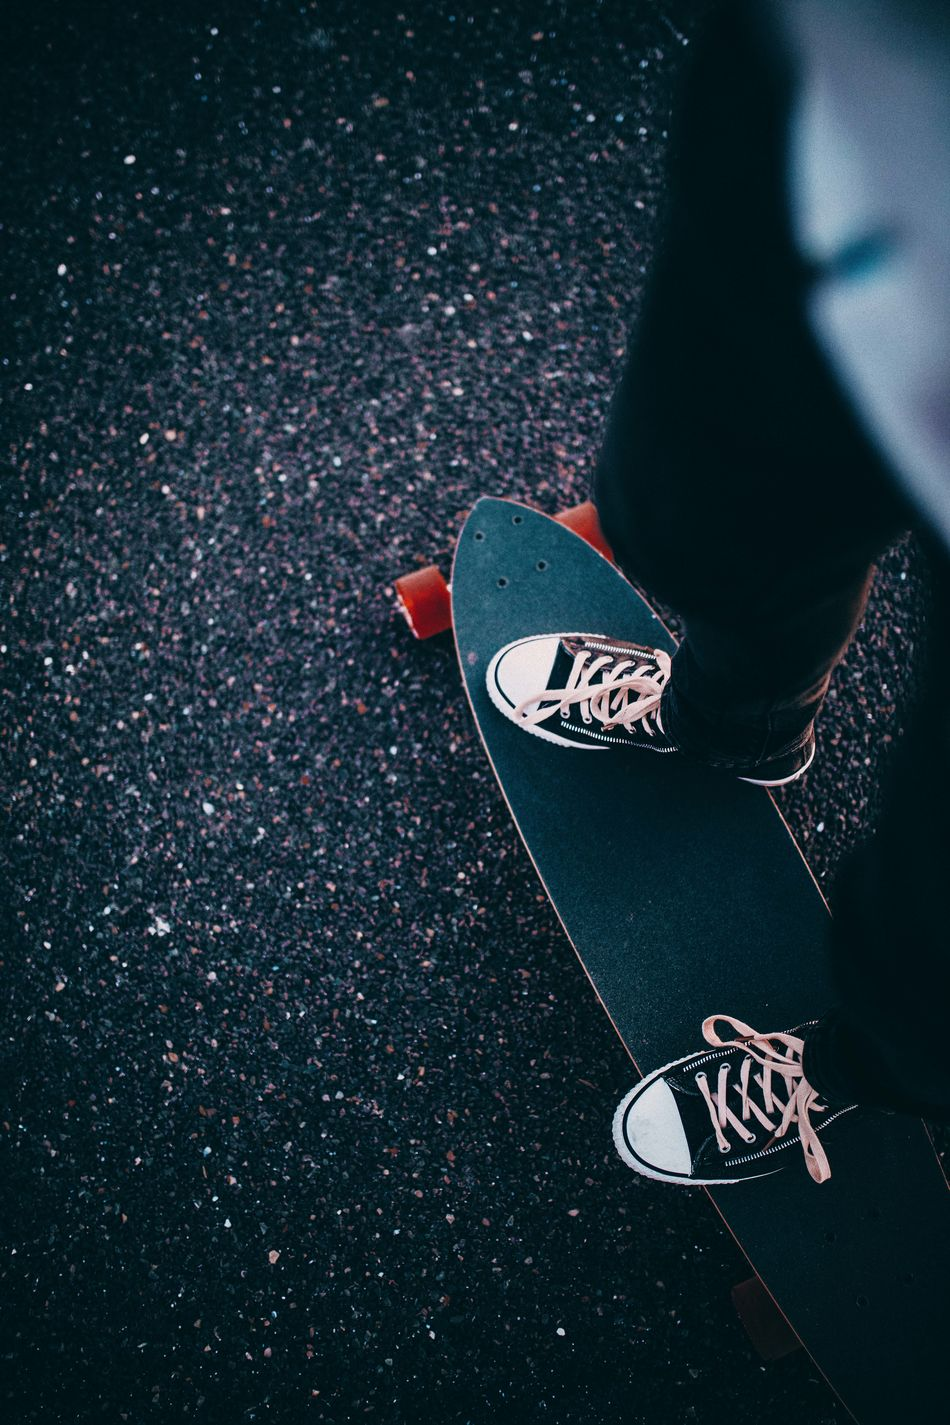 Casual Clothing Longboard Longboarding Longboards Man Promenade Recreational Pursuit Skating Sunset Urban